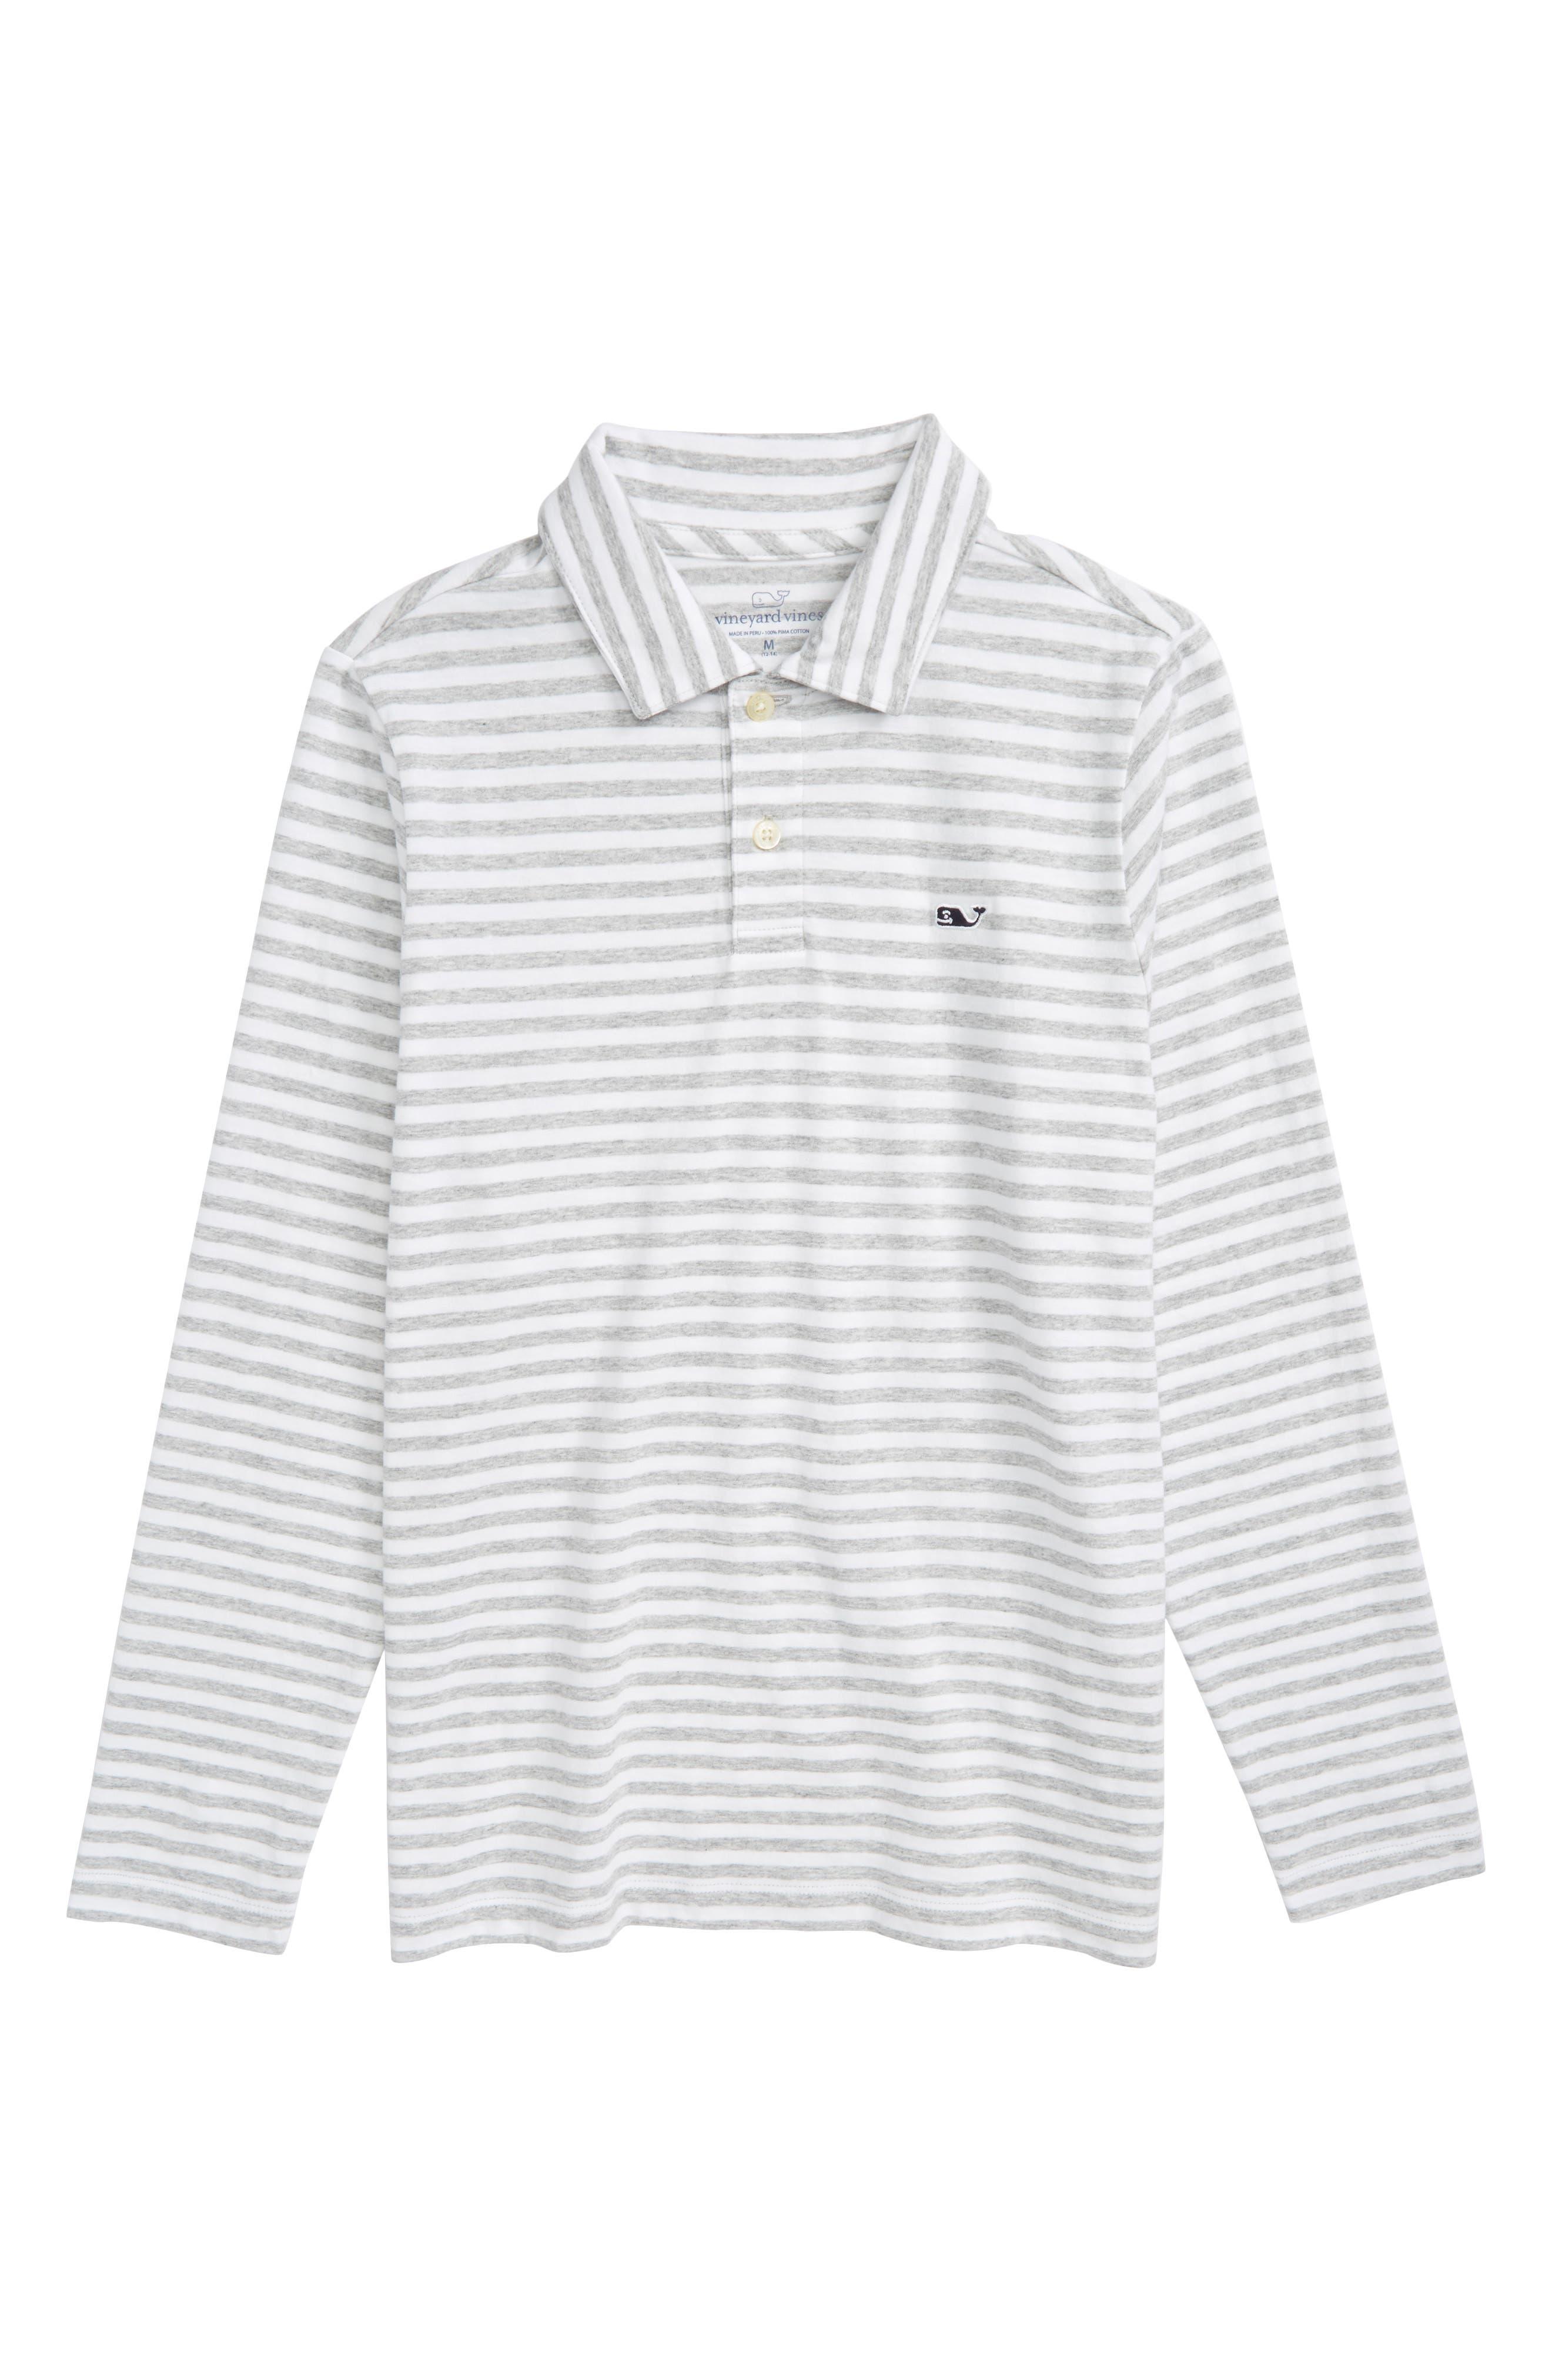 Alternate Image 1 Selected - vineyard vines Stripe Pima Cotton Jersey Polo (Toddler Boys & Little Boys)